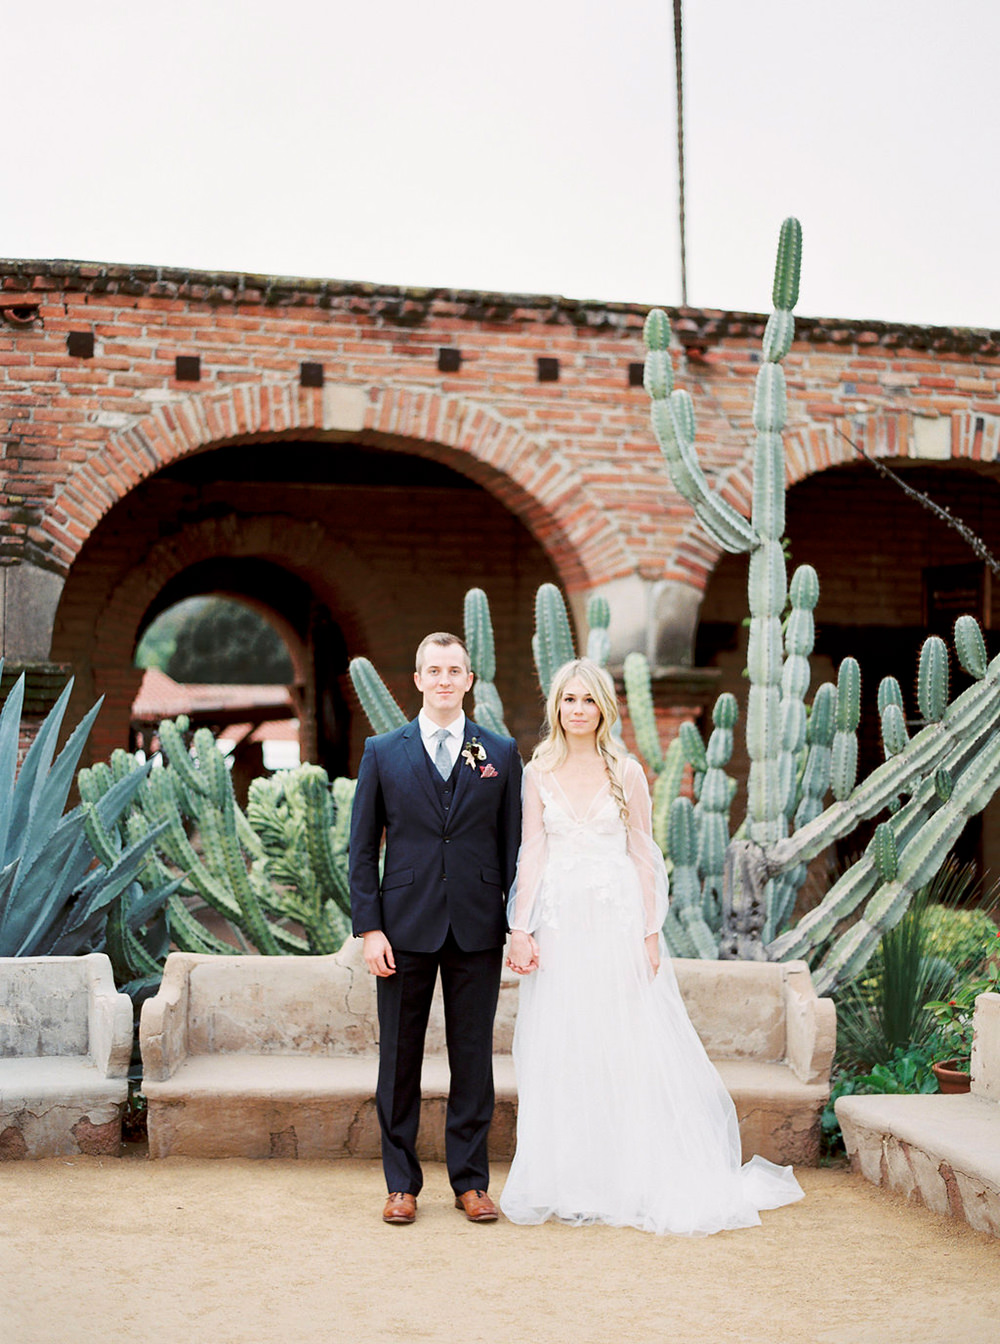 San Juan Capistrano weddings - photo by Amanda Lenhardt https://ruffledblog.com/relaxed-san-juan-capistrano-wedding-inspiration